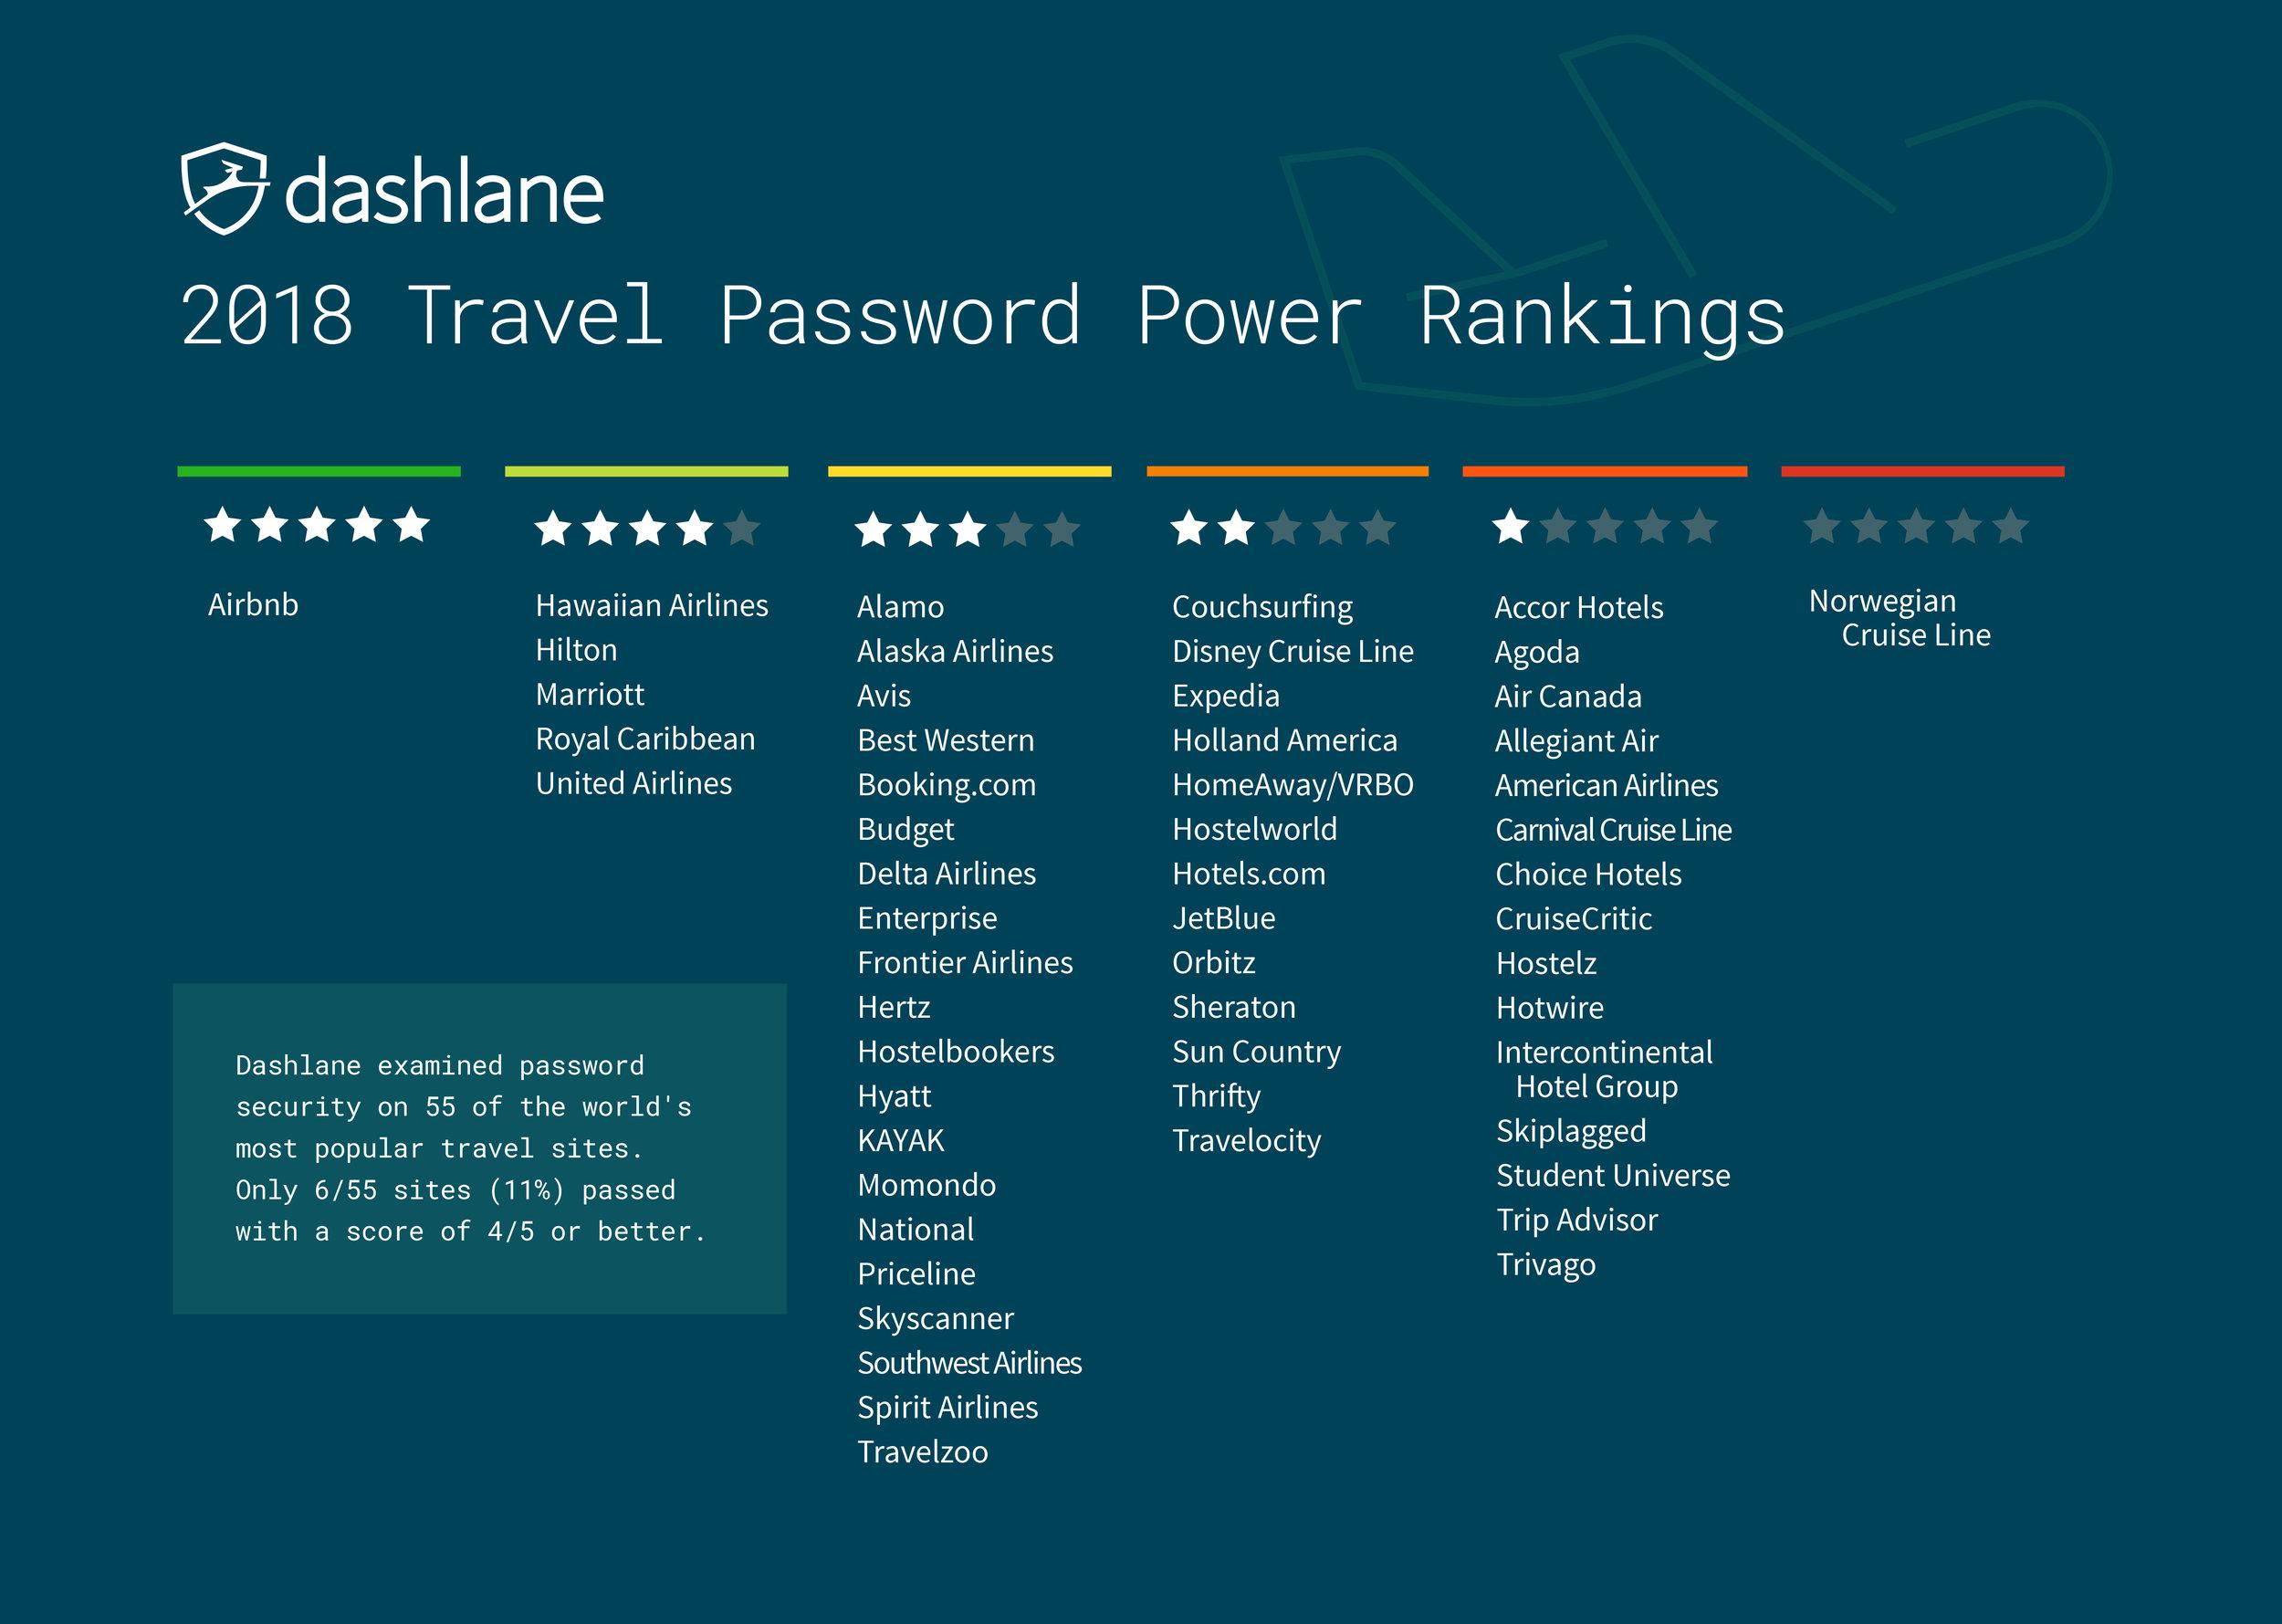 Photo credit: Dashlane  2018 Travel Website Password Power Rankings